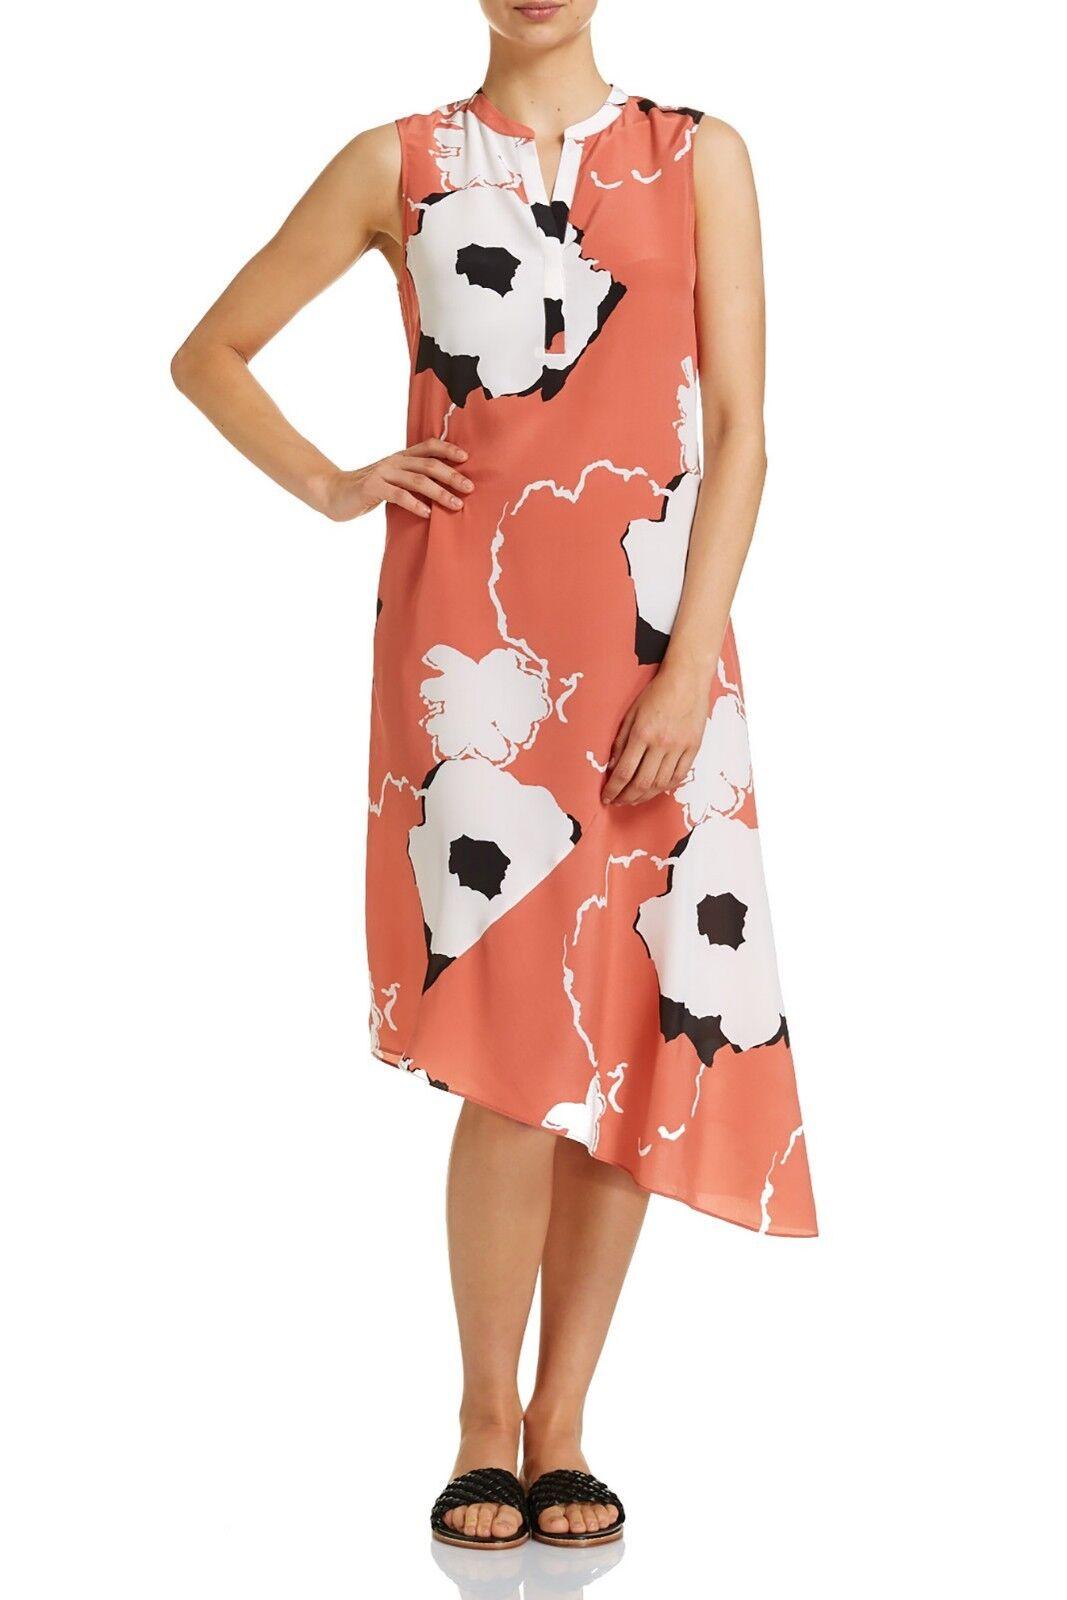 SPORTSCRAFT   pinkwood  100% Silk dress last season 10 BNWT  289.99